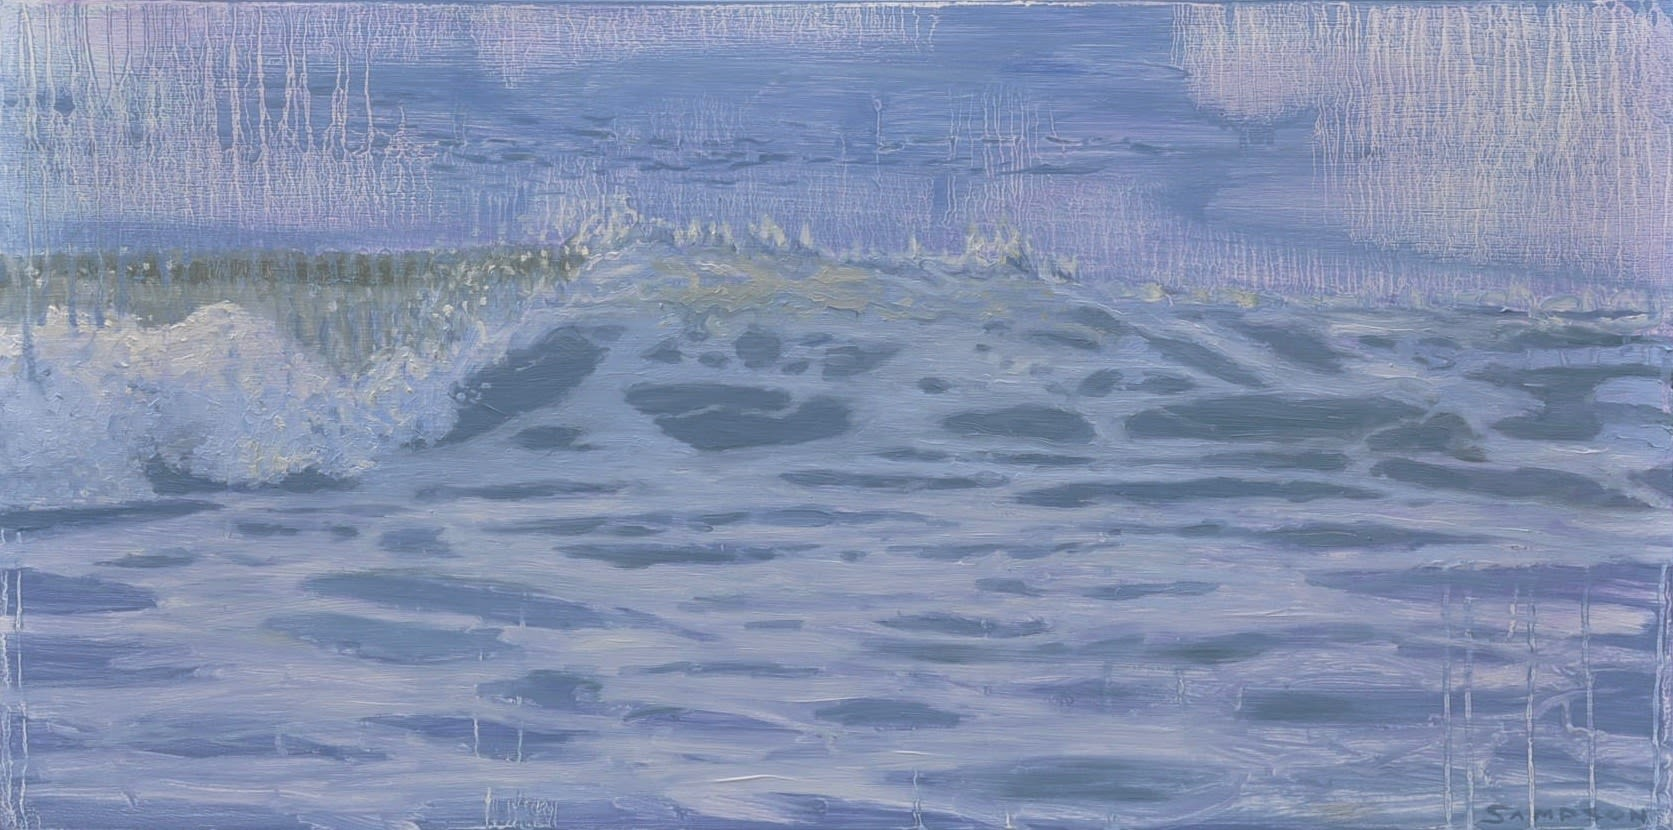 'Beach Break' by Joe Sampson at Gallery 133